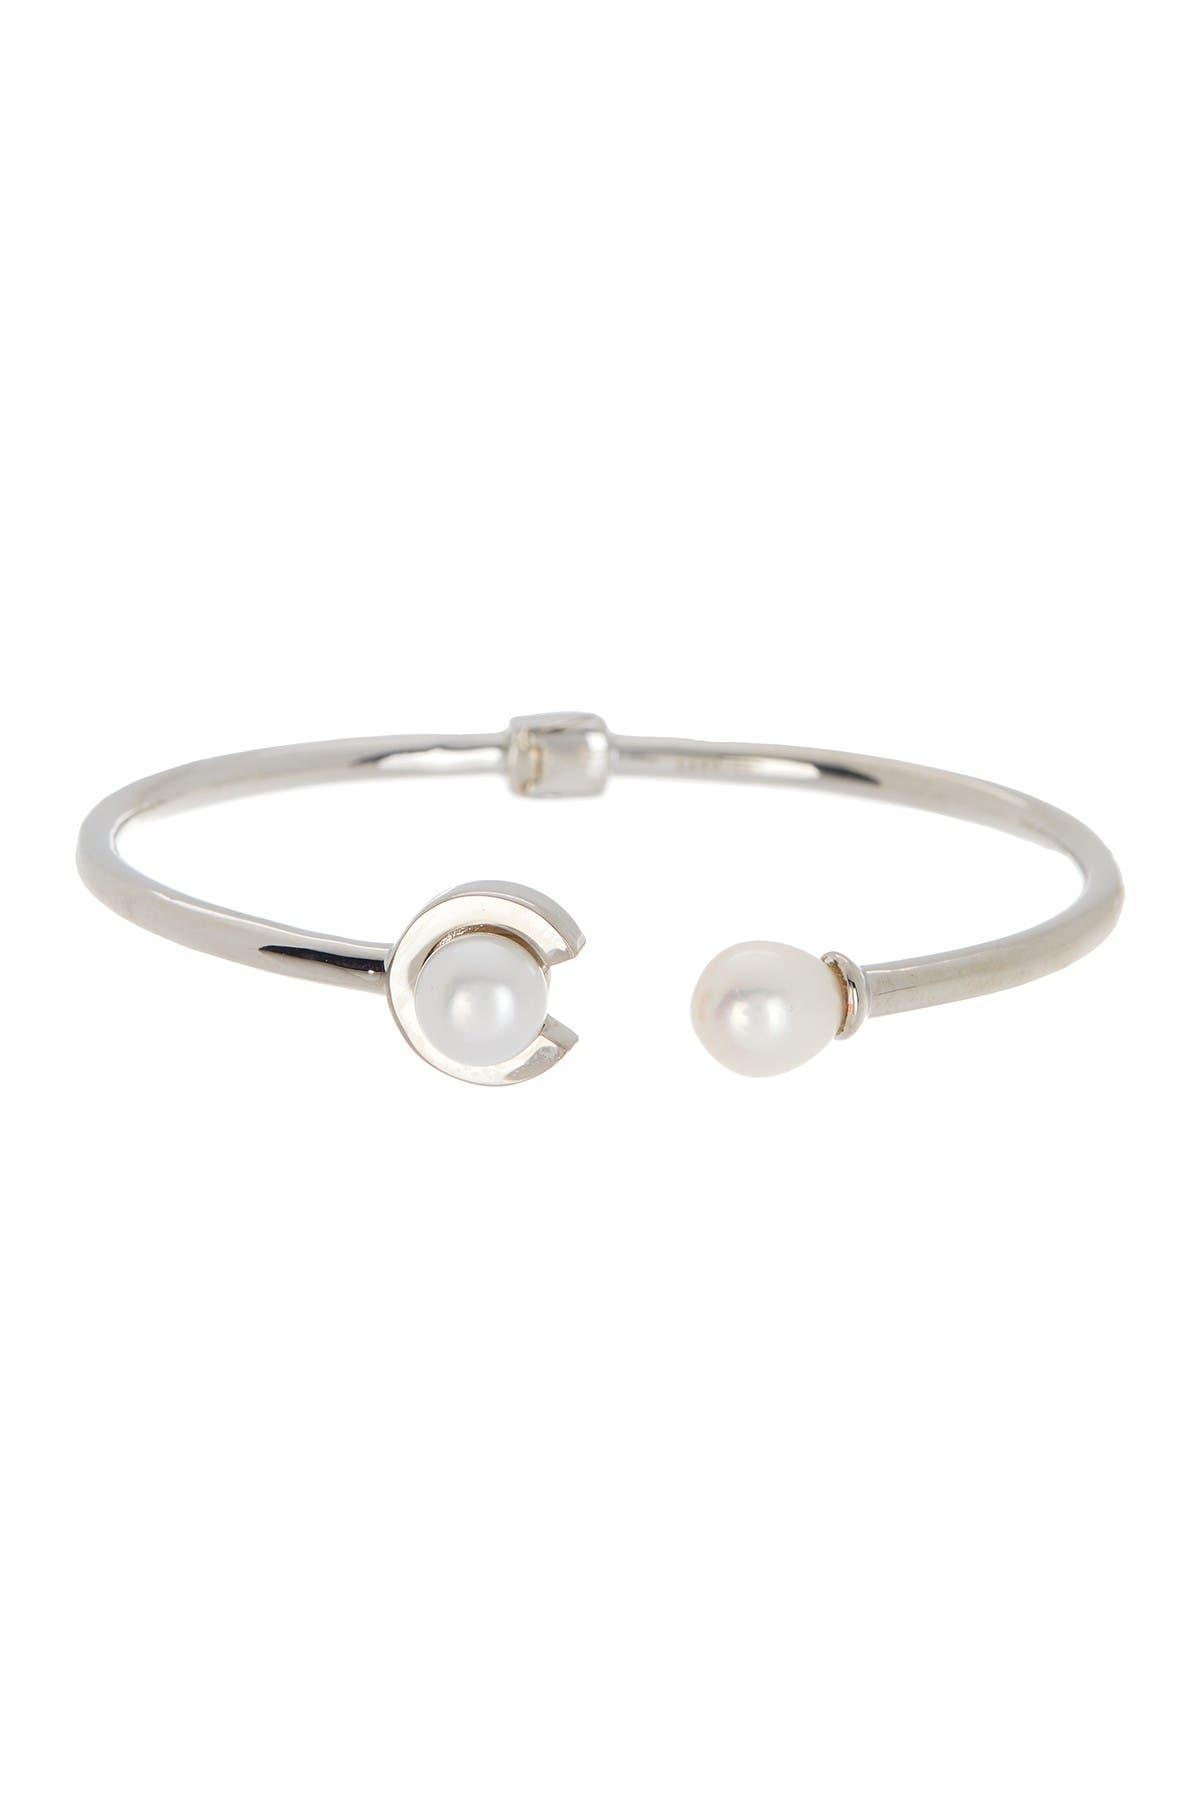 Image of Carolee Silver Pearl Cap Hinged Cuff Bracelet